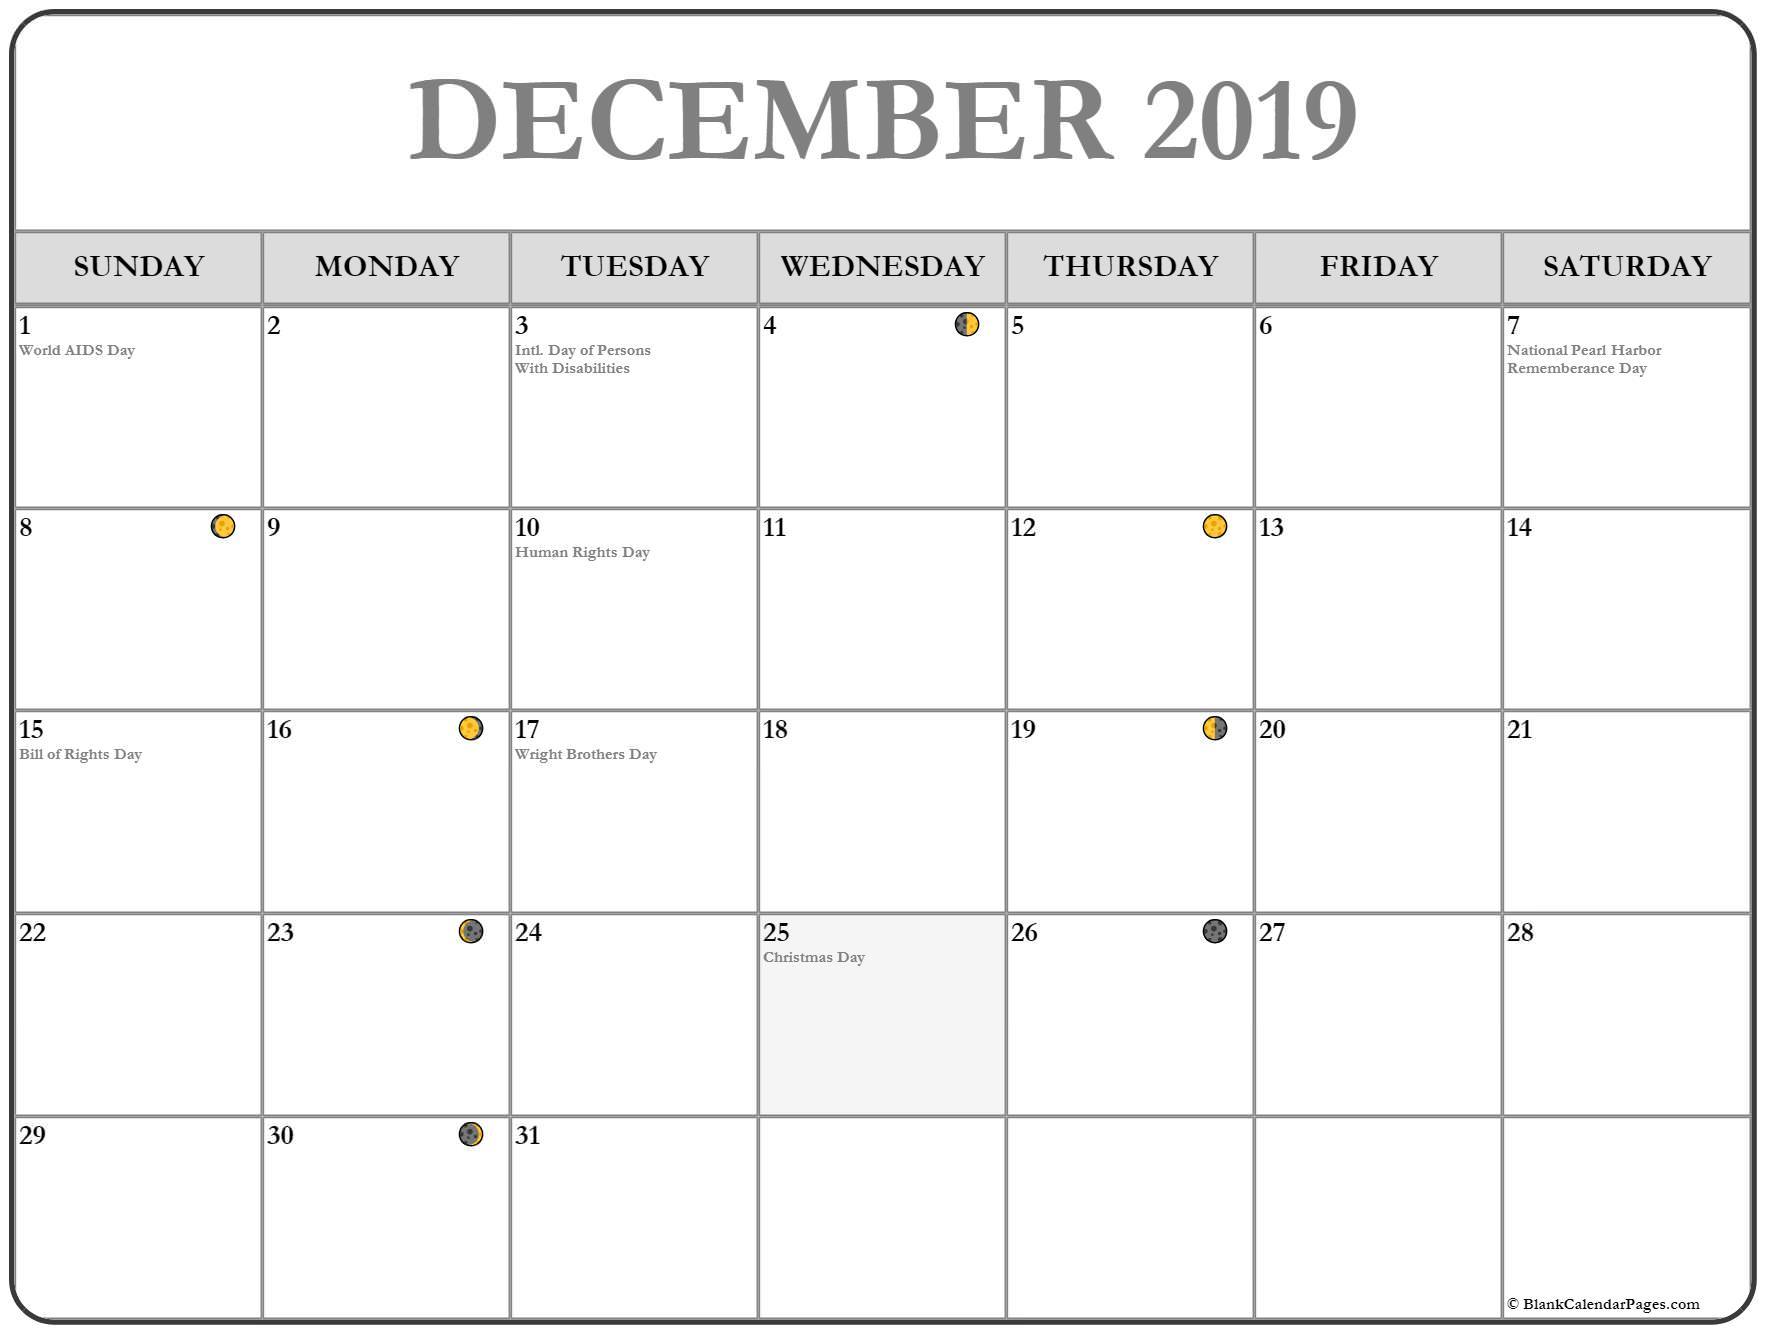 December 2019 Moon Calendar Phases